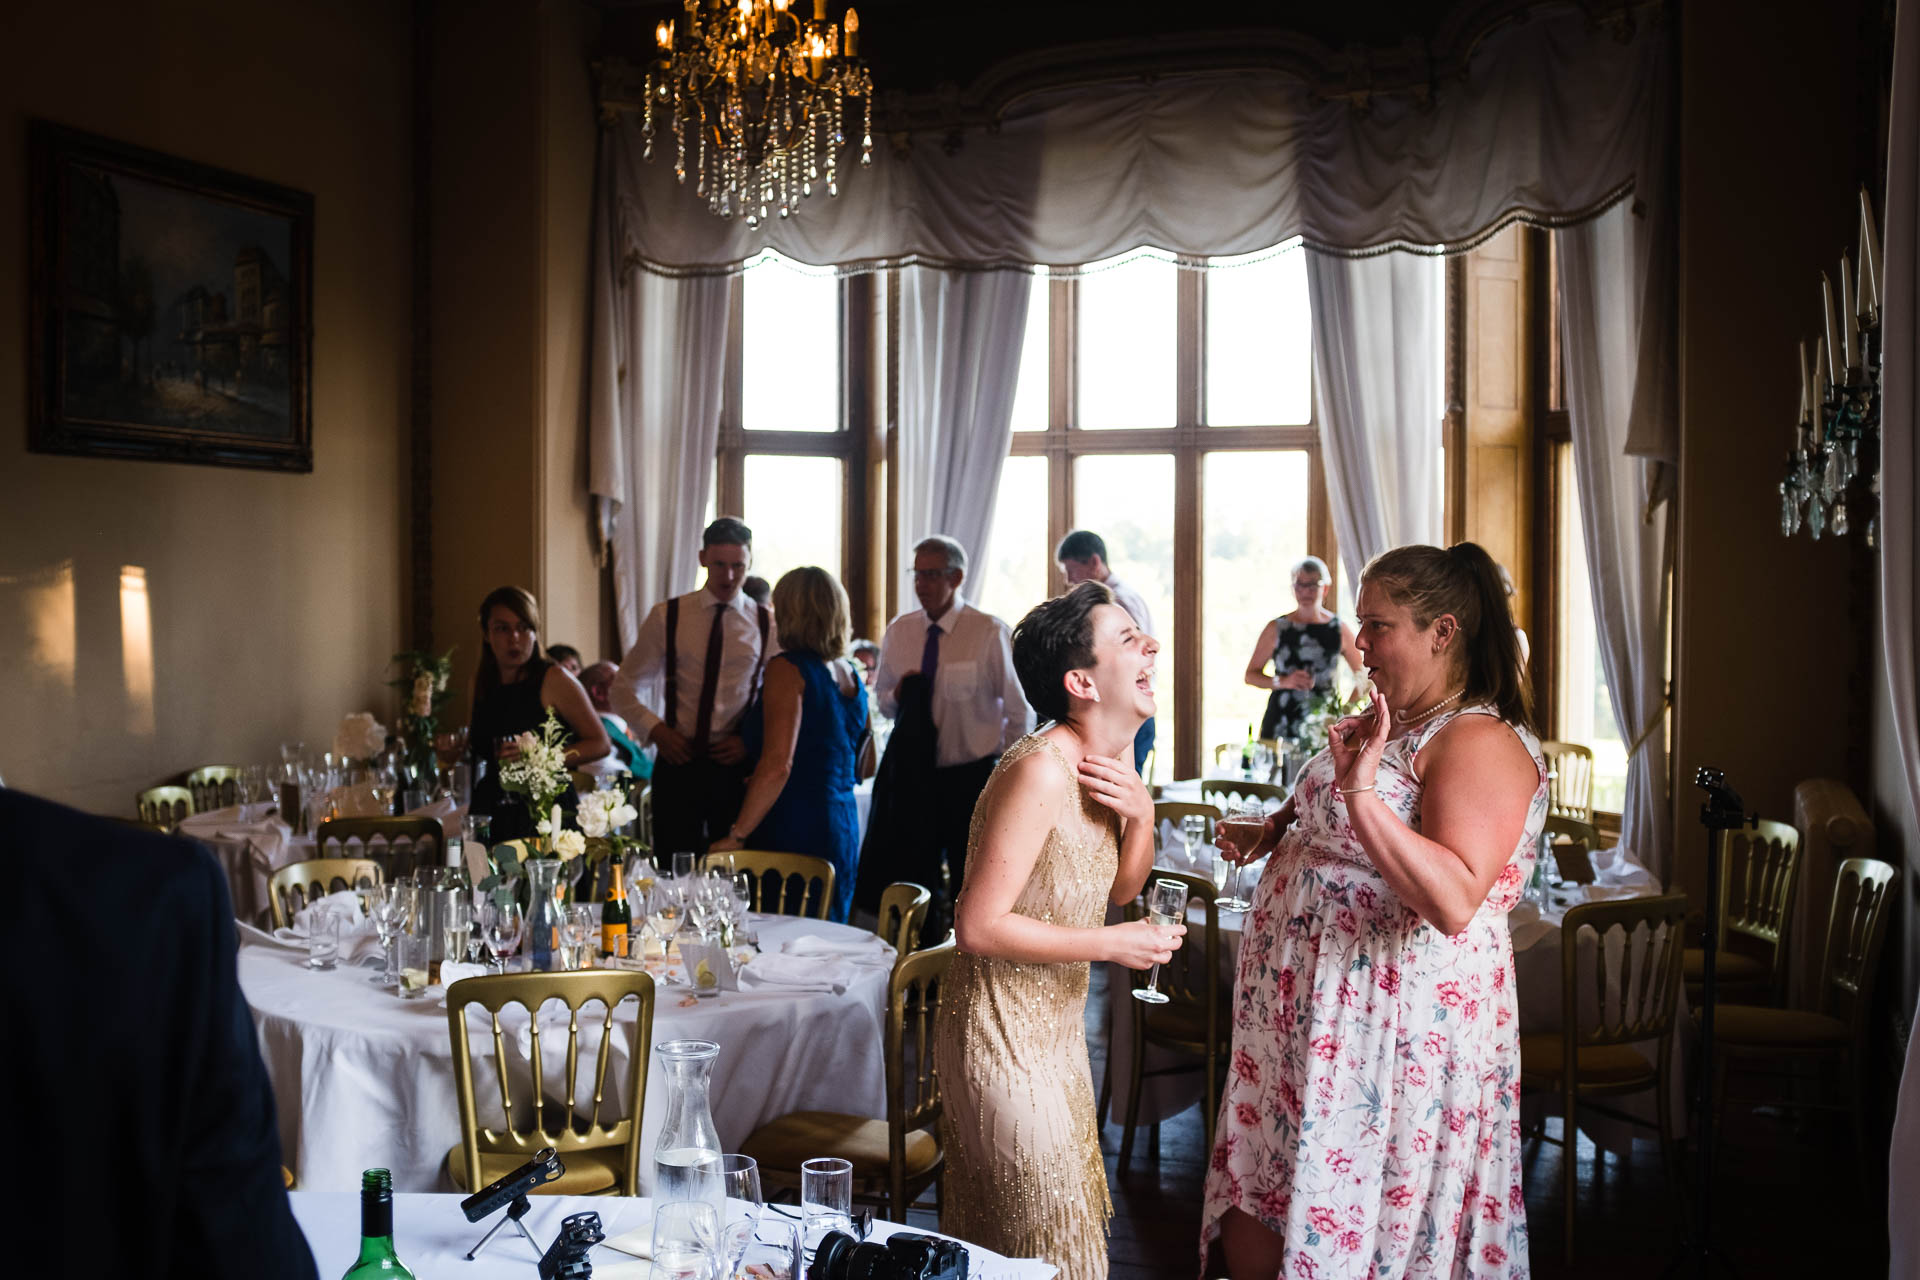 orchardleigh house wedding - Danni & Barney (418).jpg